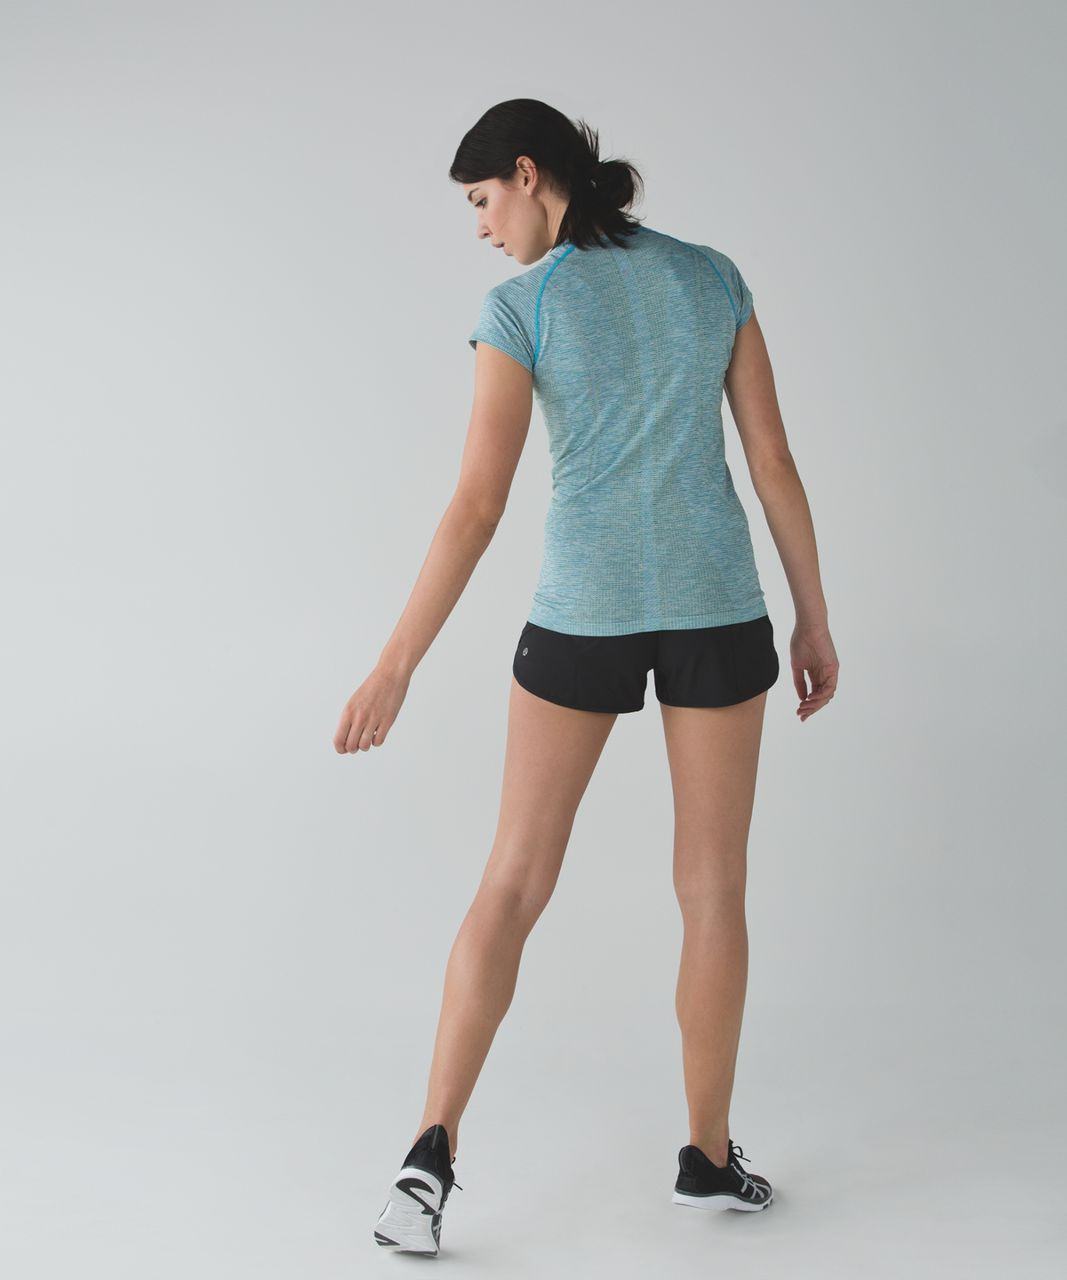 Lululemon Swiftly Tech Short Sleeve Crew - Peacock Blue / Tranquil Blue